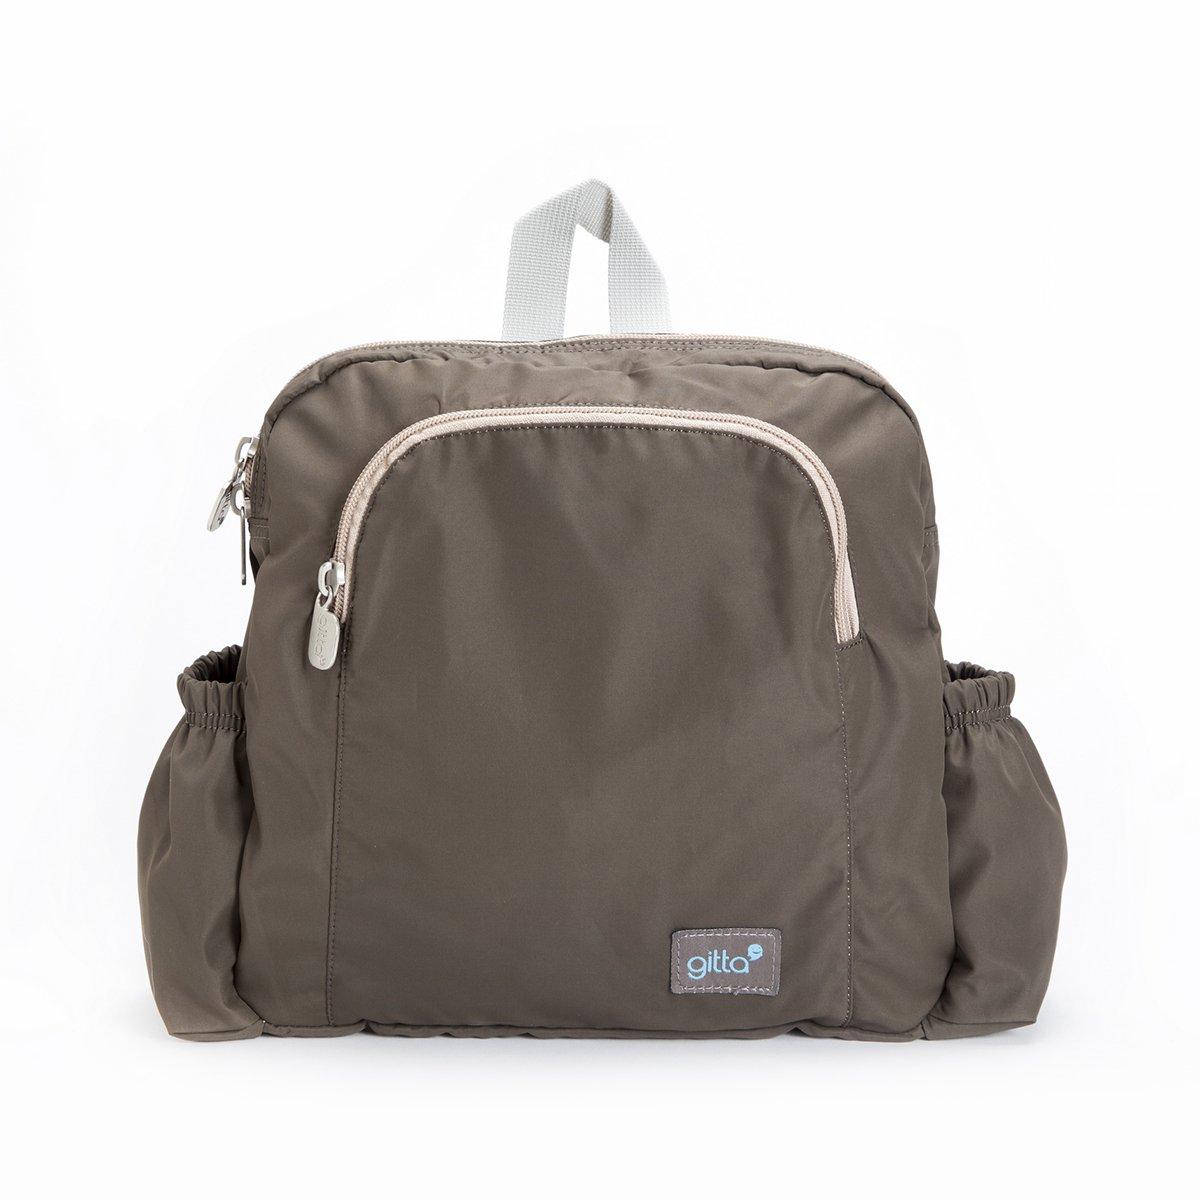 Gitta Mini Ideal Kids School Bag Child Infant preschool Backpack, Brown by Gitta B01I1WHBTQ